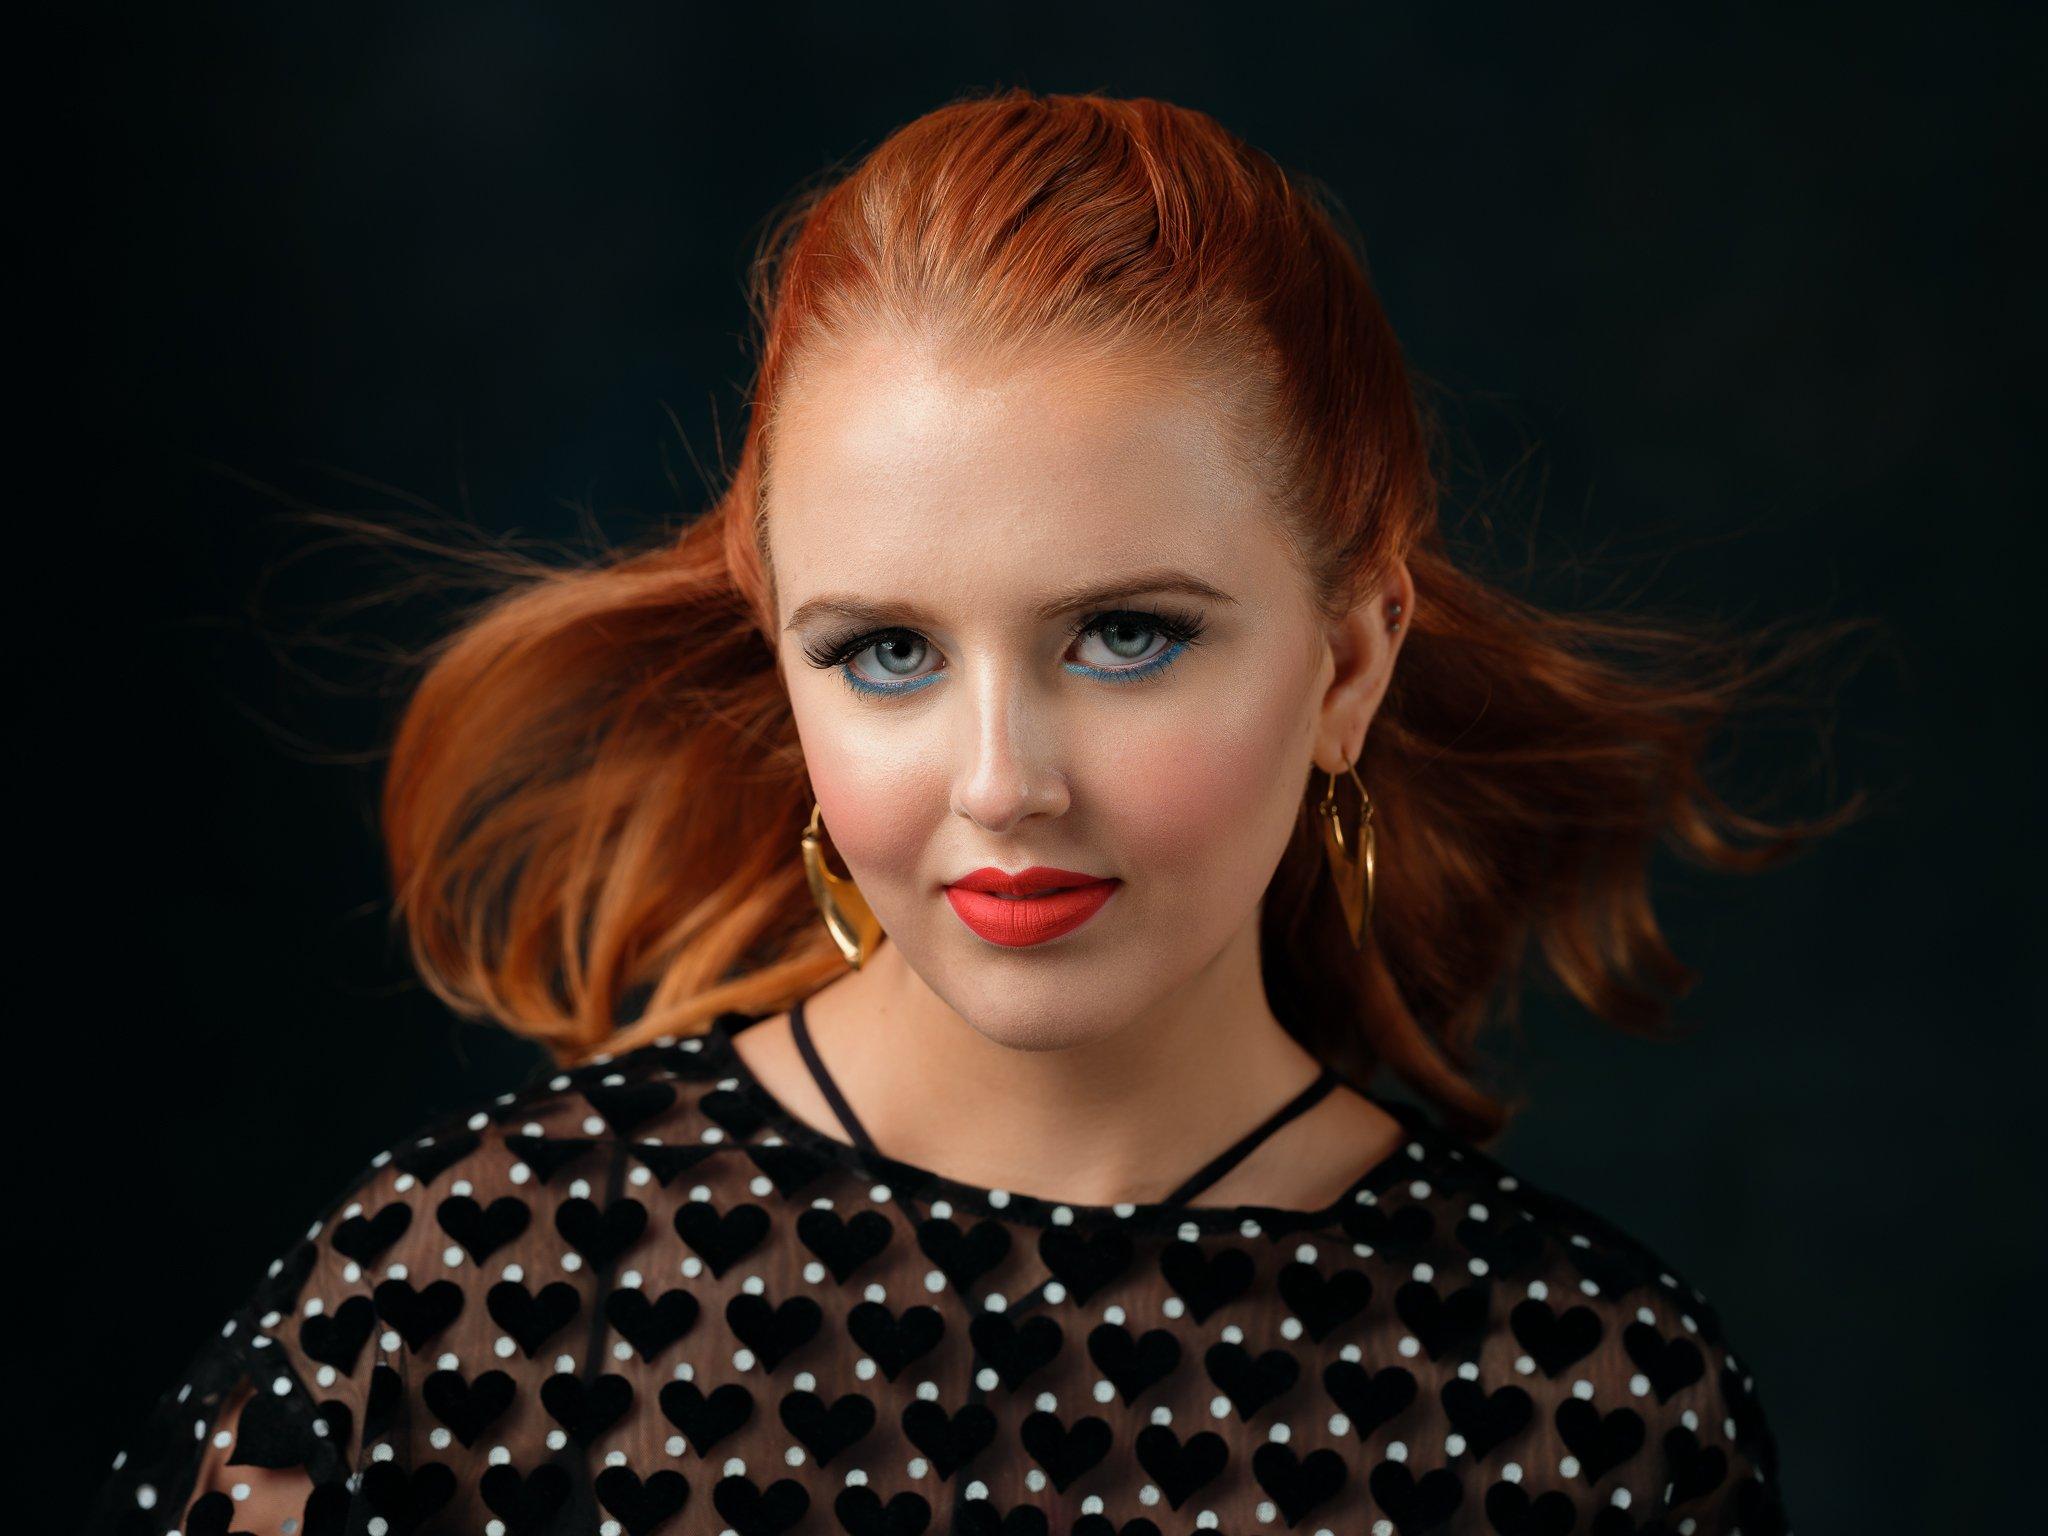 beauty, portrait, girl, young, female, redhead, Saulius Ke